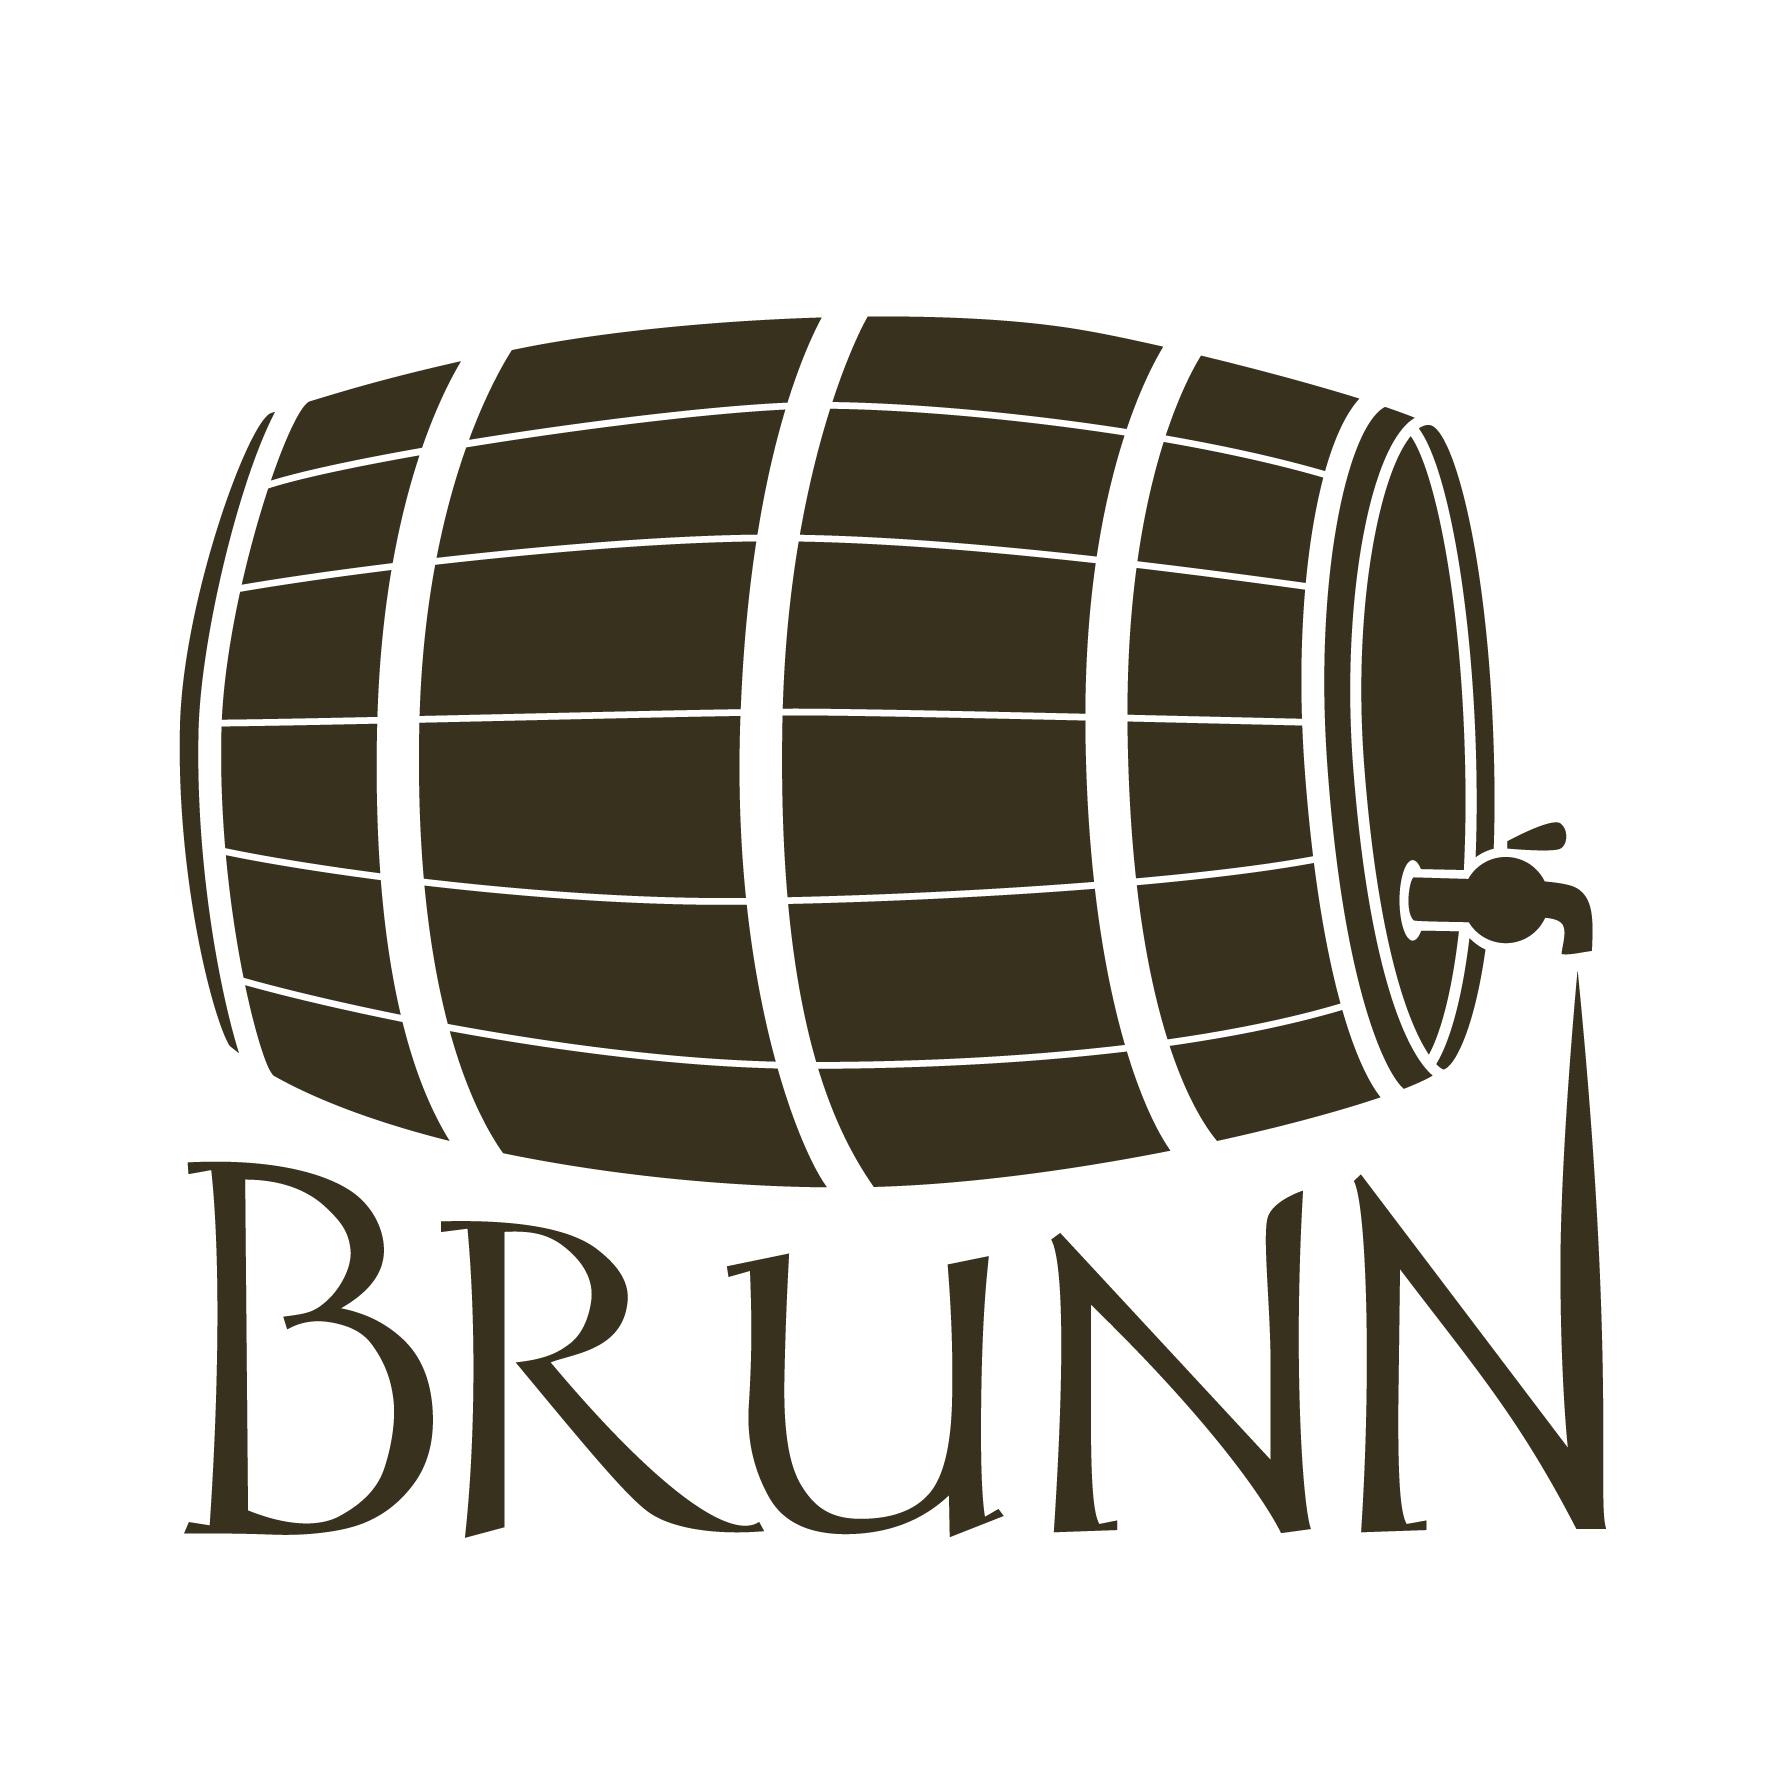 Brouwerij Brunn